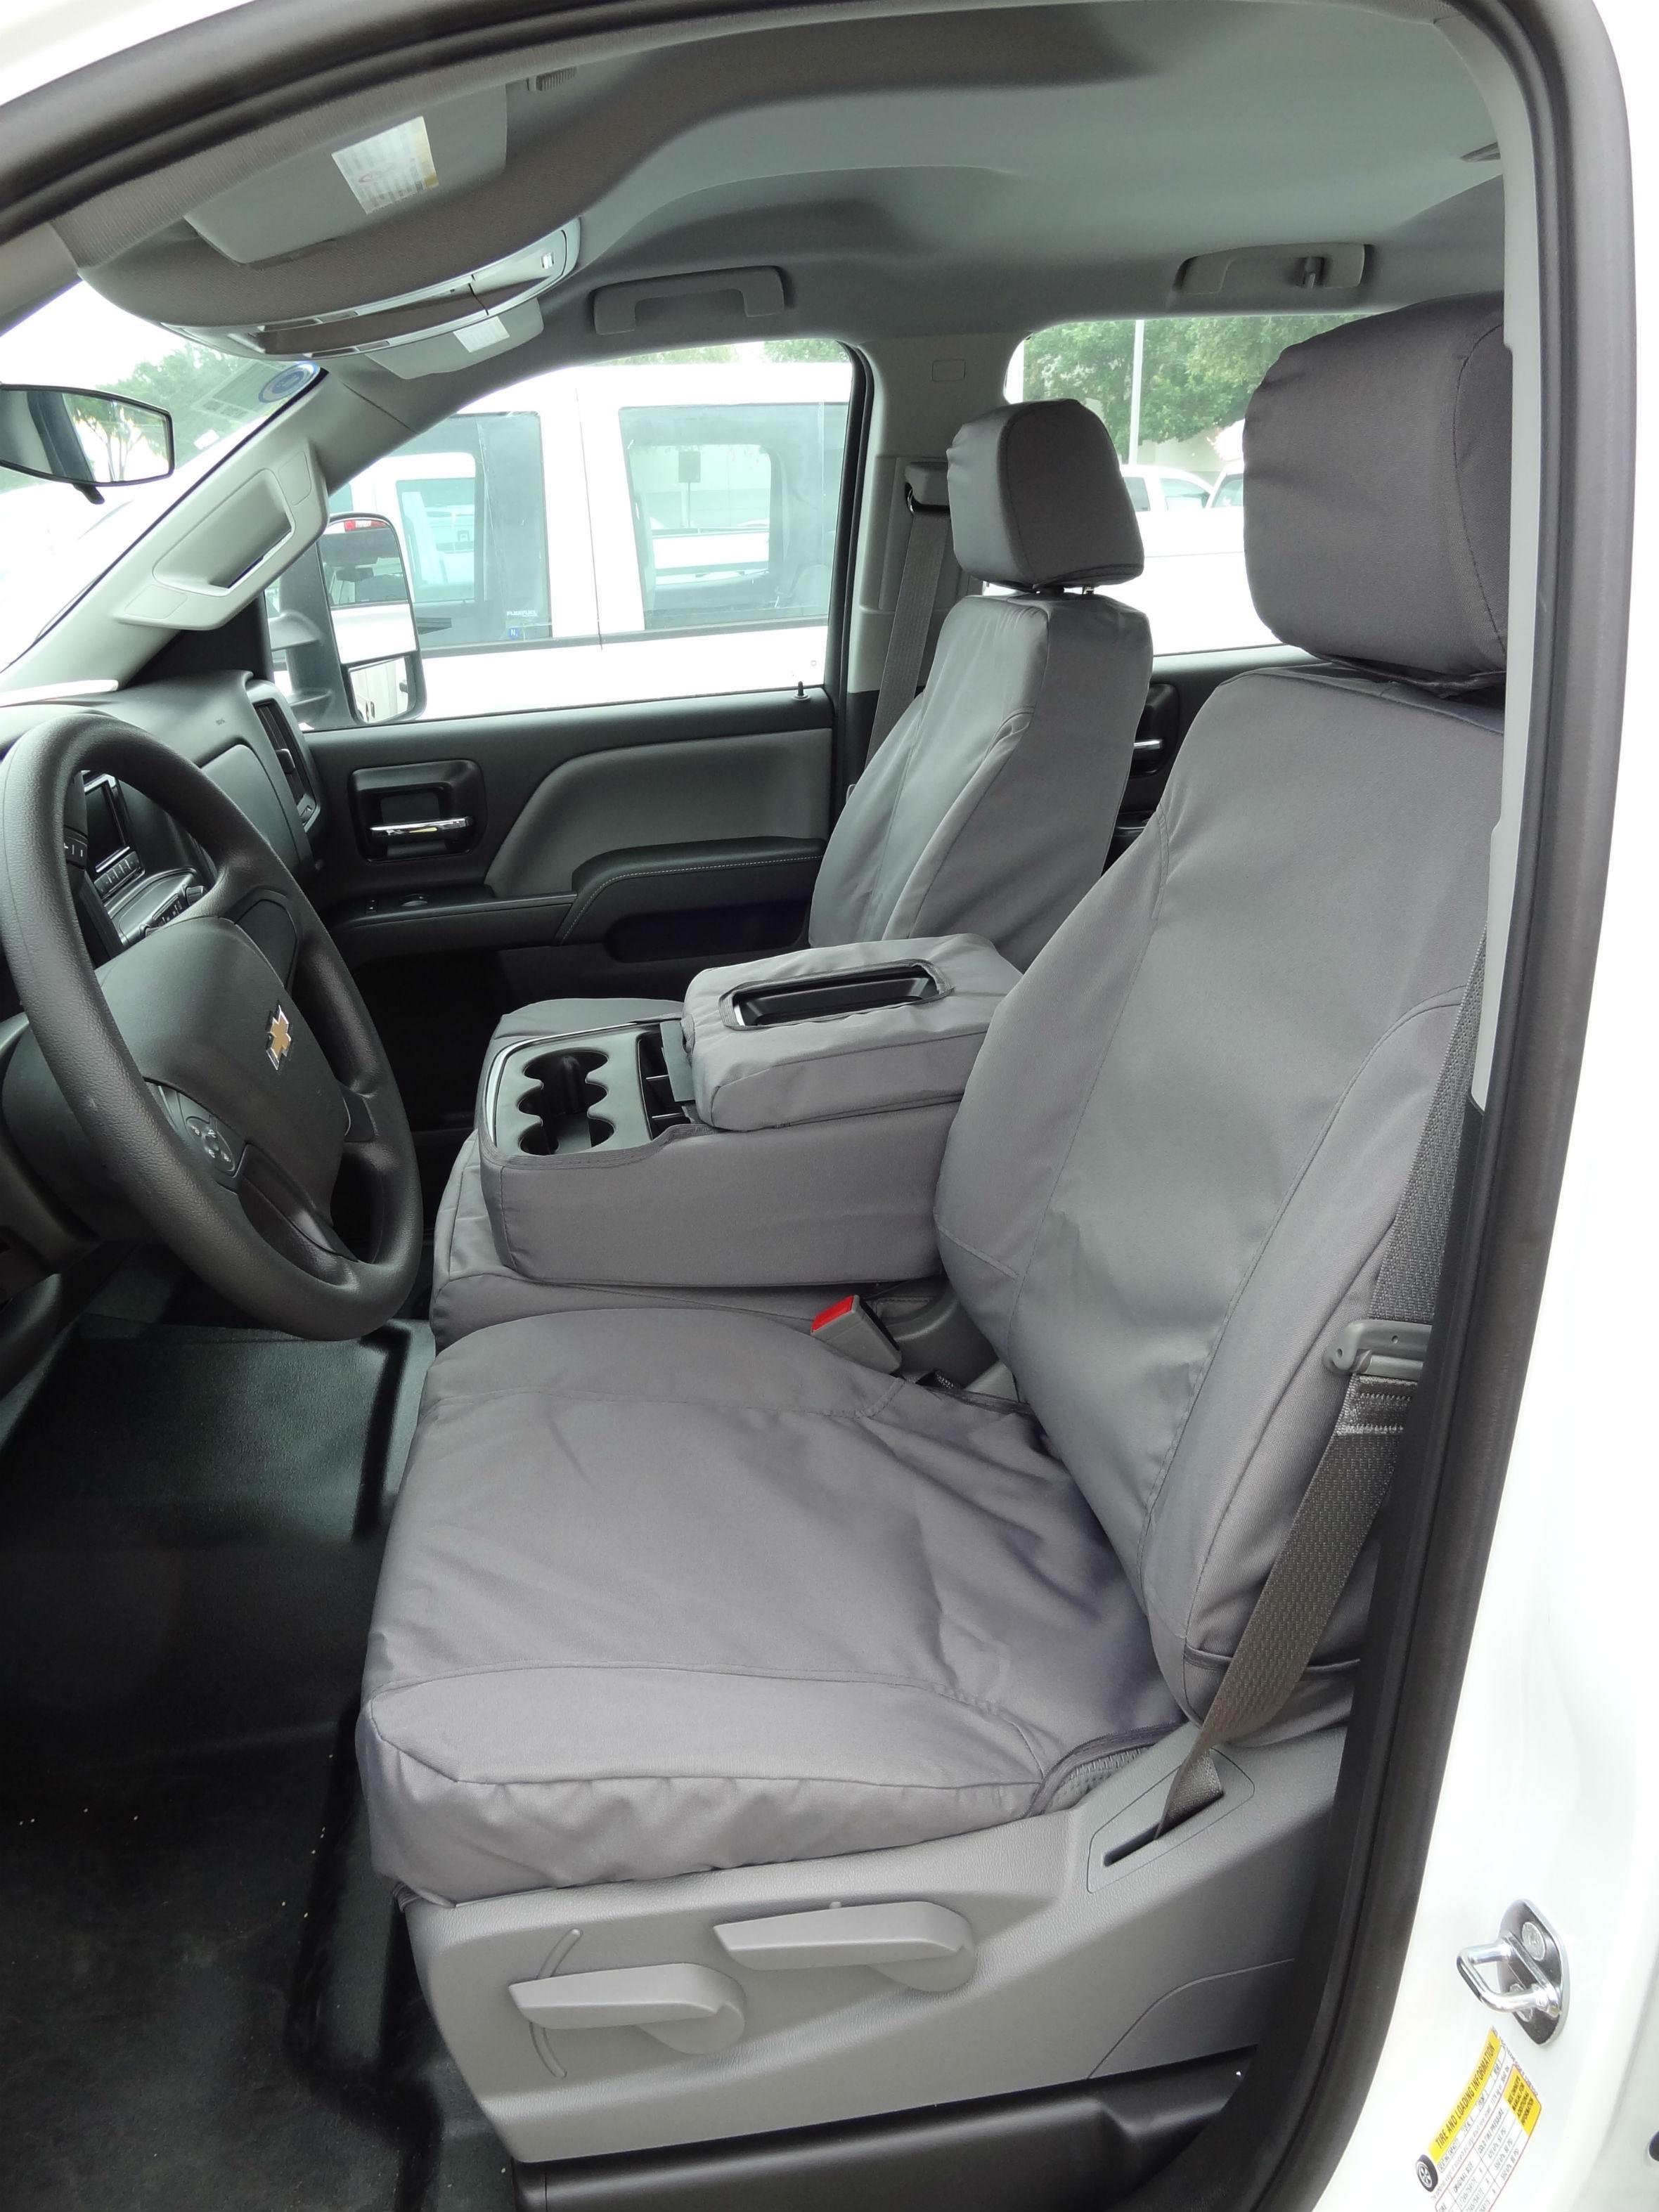 2014 2019 Chevy Silverado Front 40 20 40 Split Bench Seat